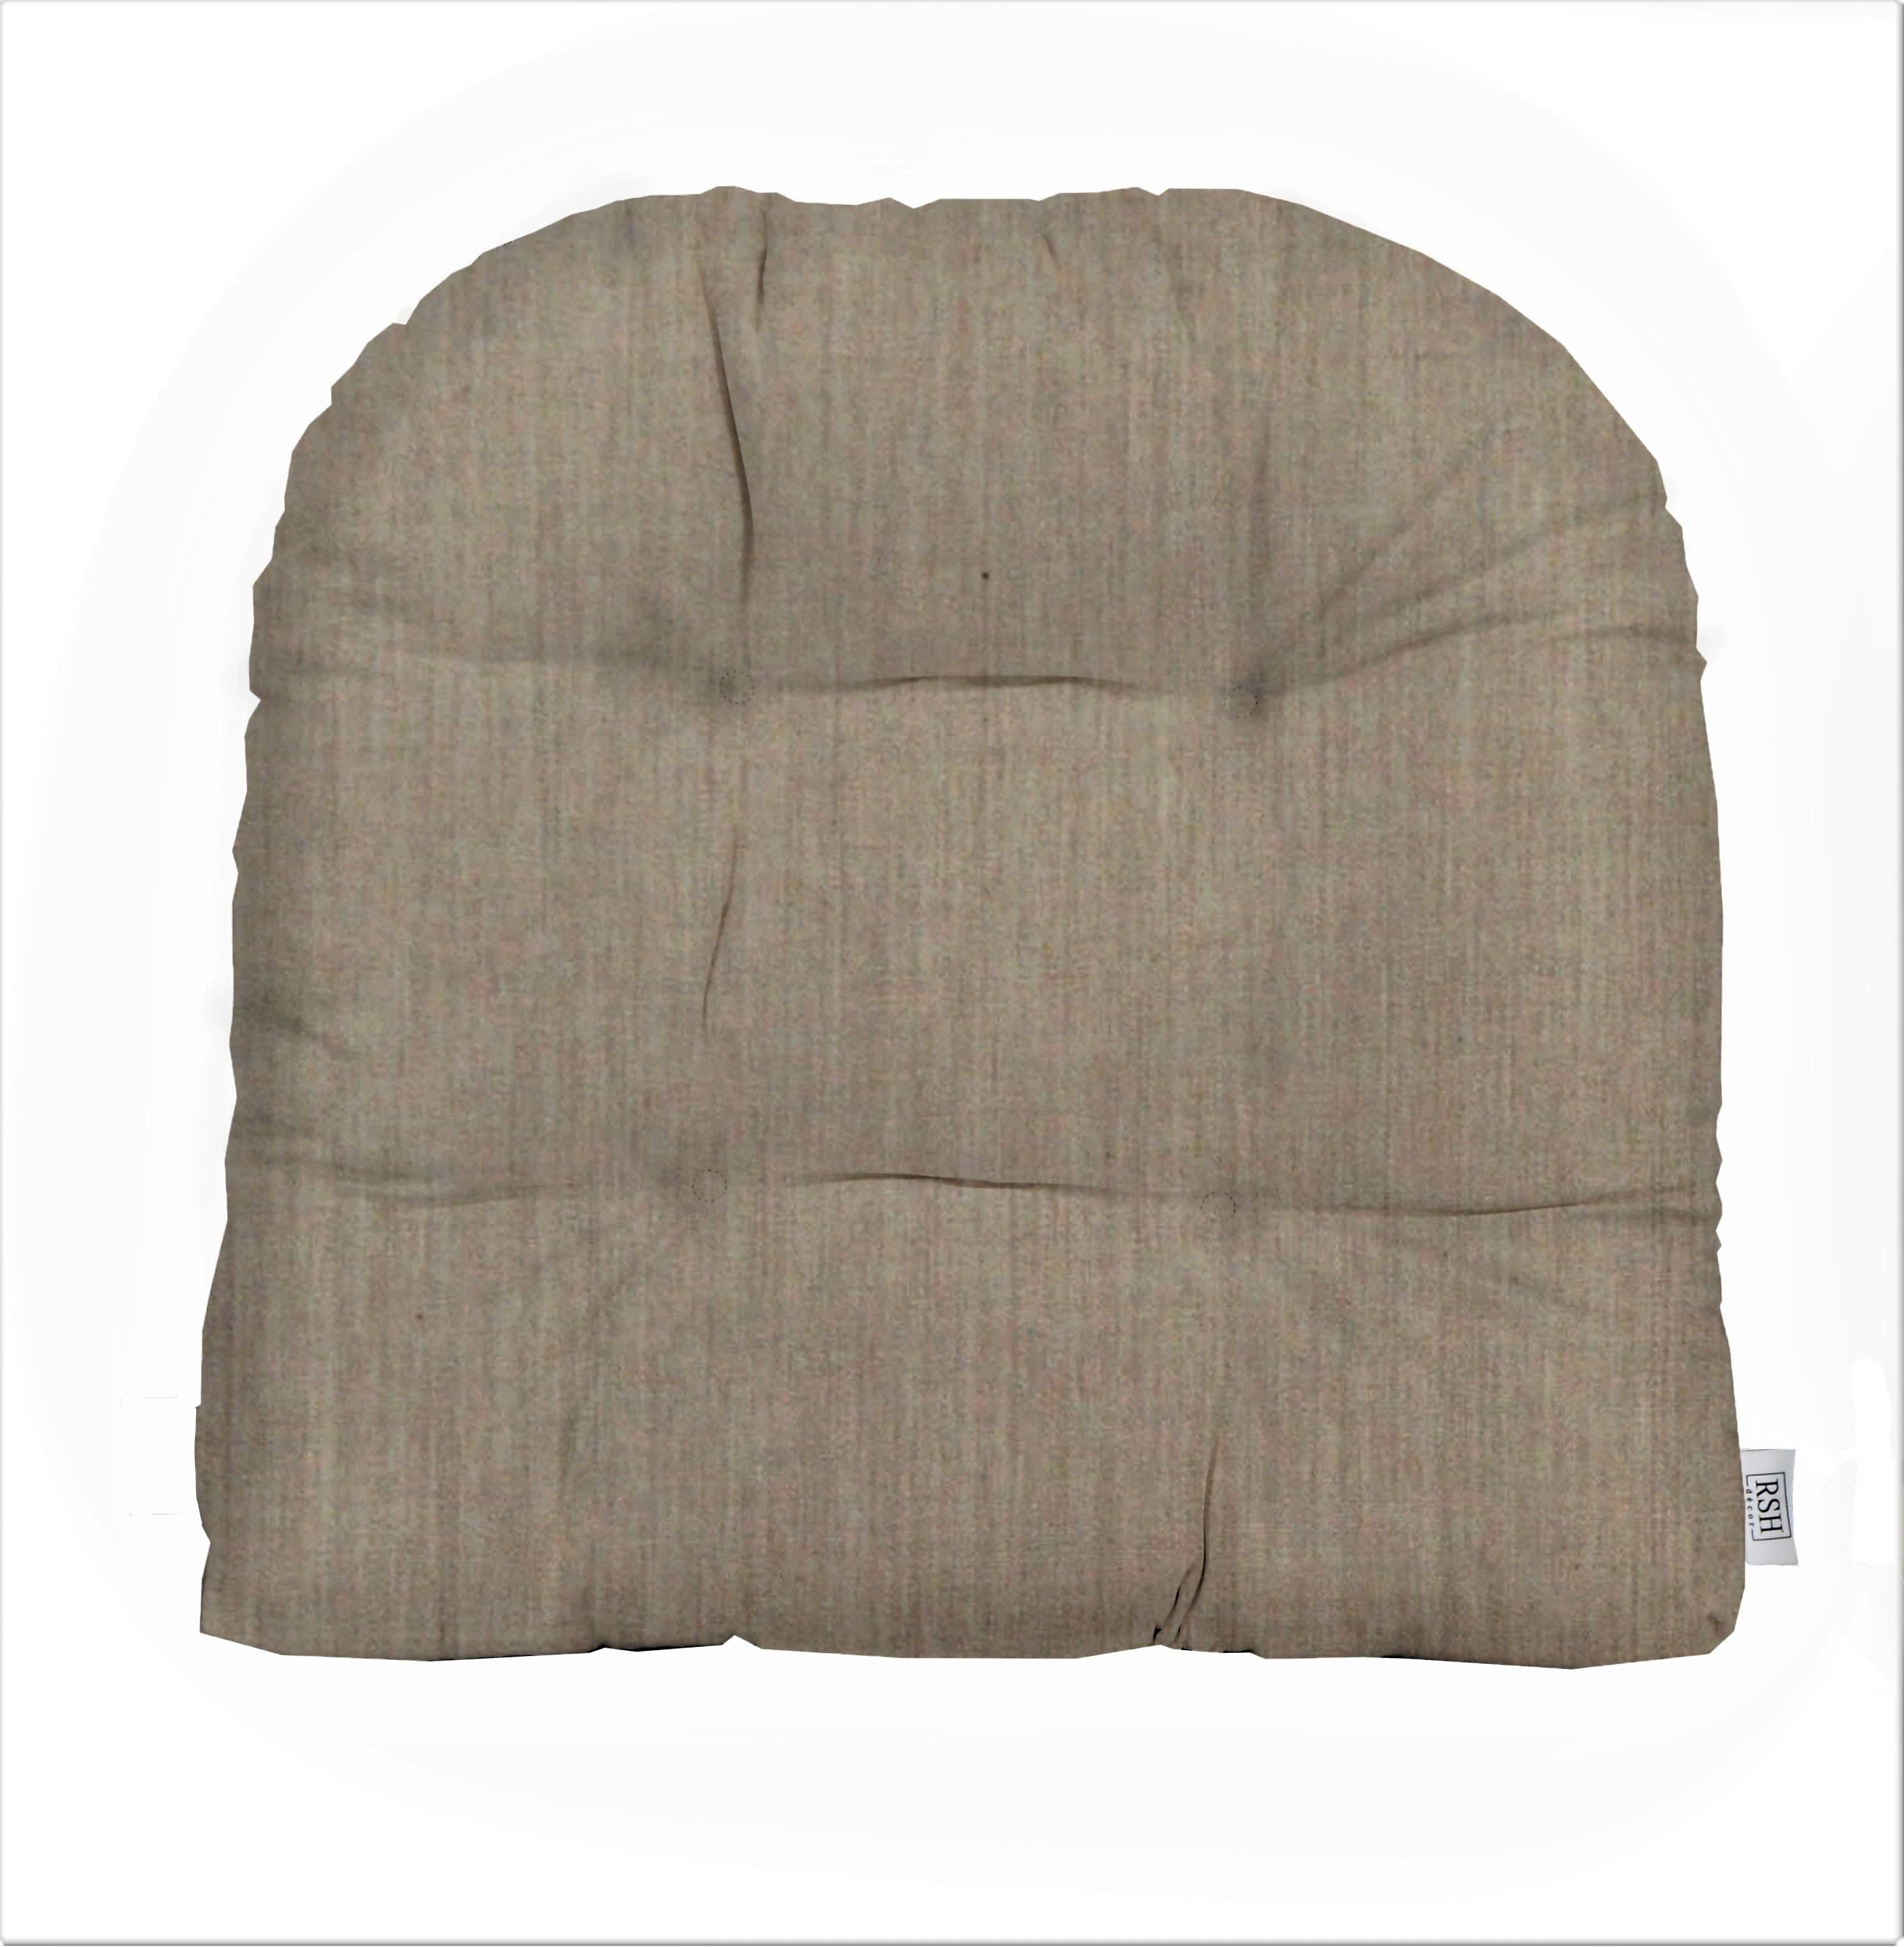 Sunbrella Canvas Flax Wicker Chair Cushion Indoor Outdoor Tufted Wicker Chair Seat Cushion Choose Size